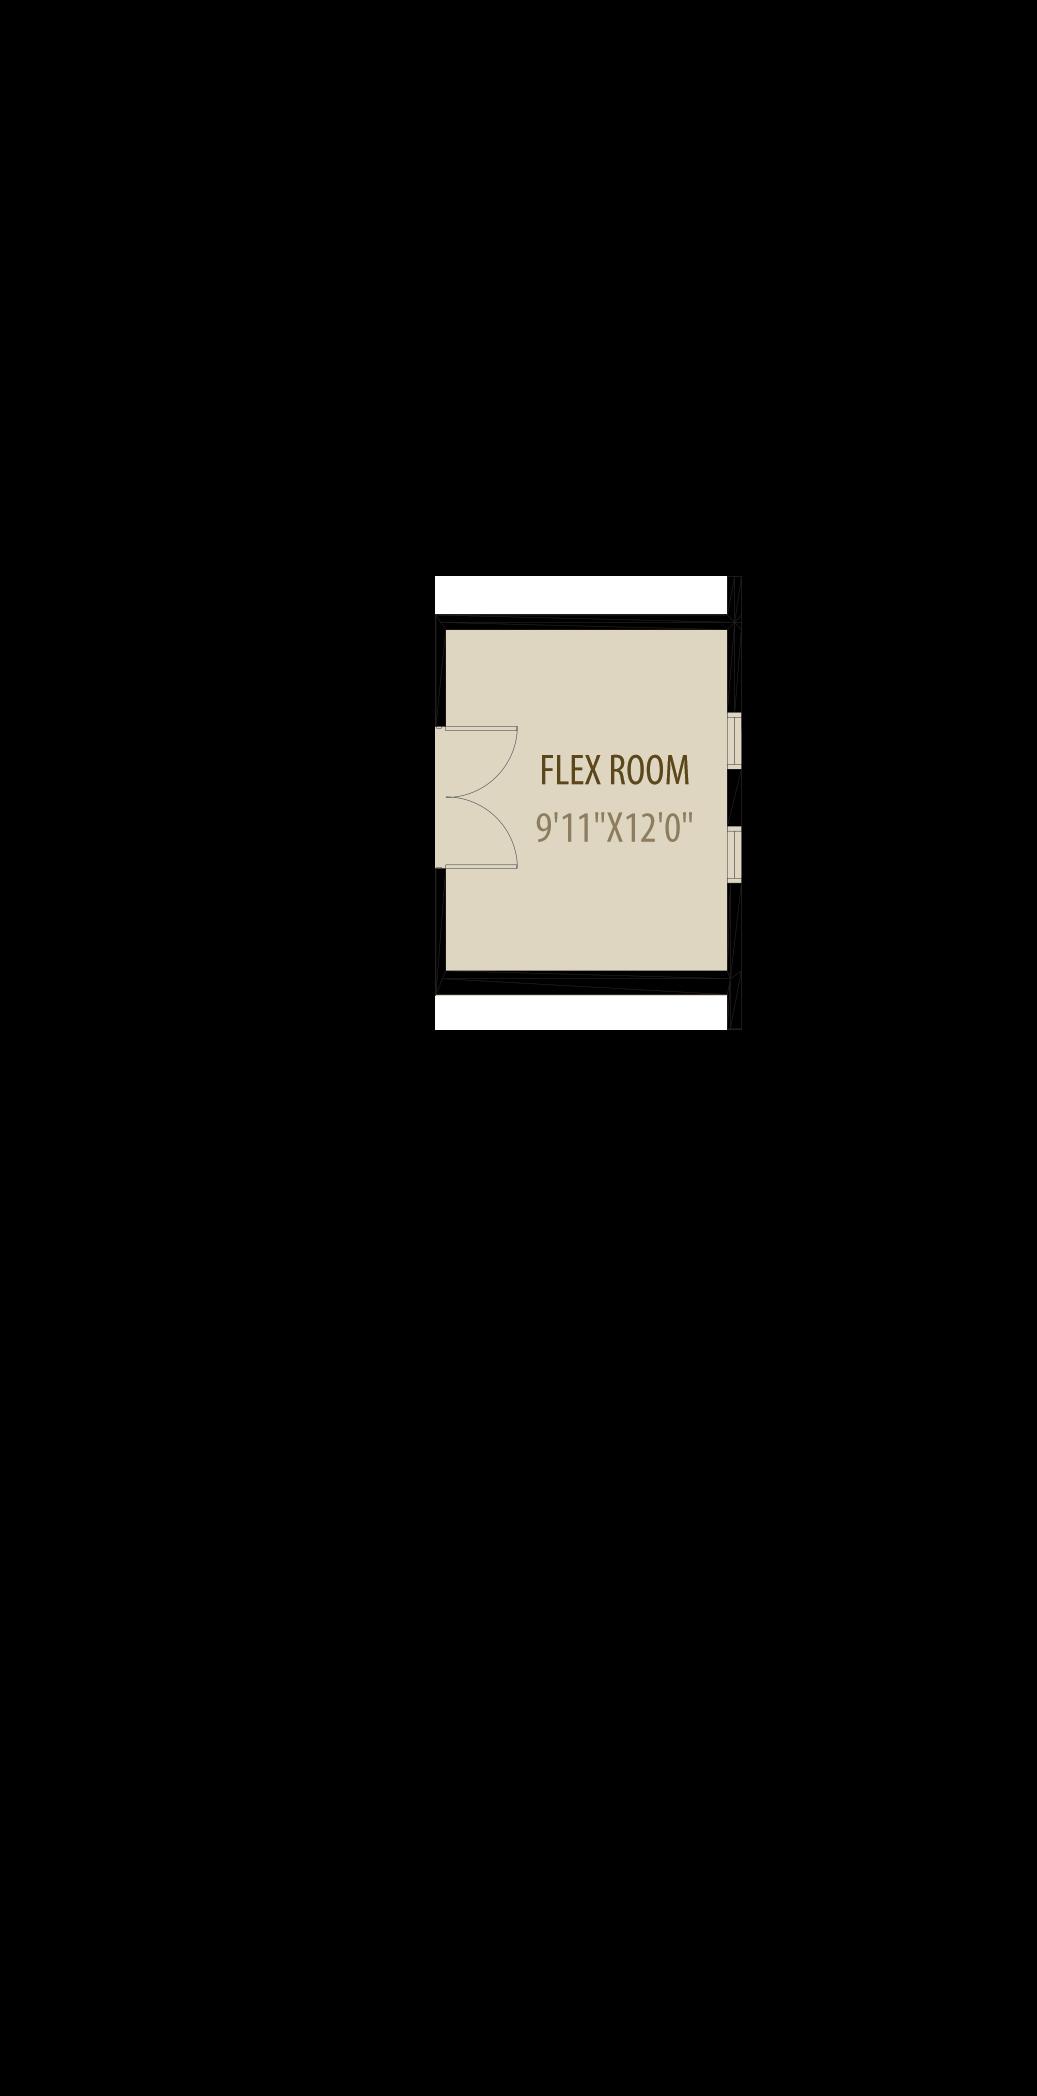 Enclosed Flex Room